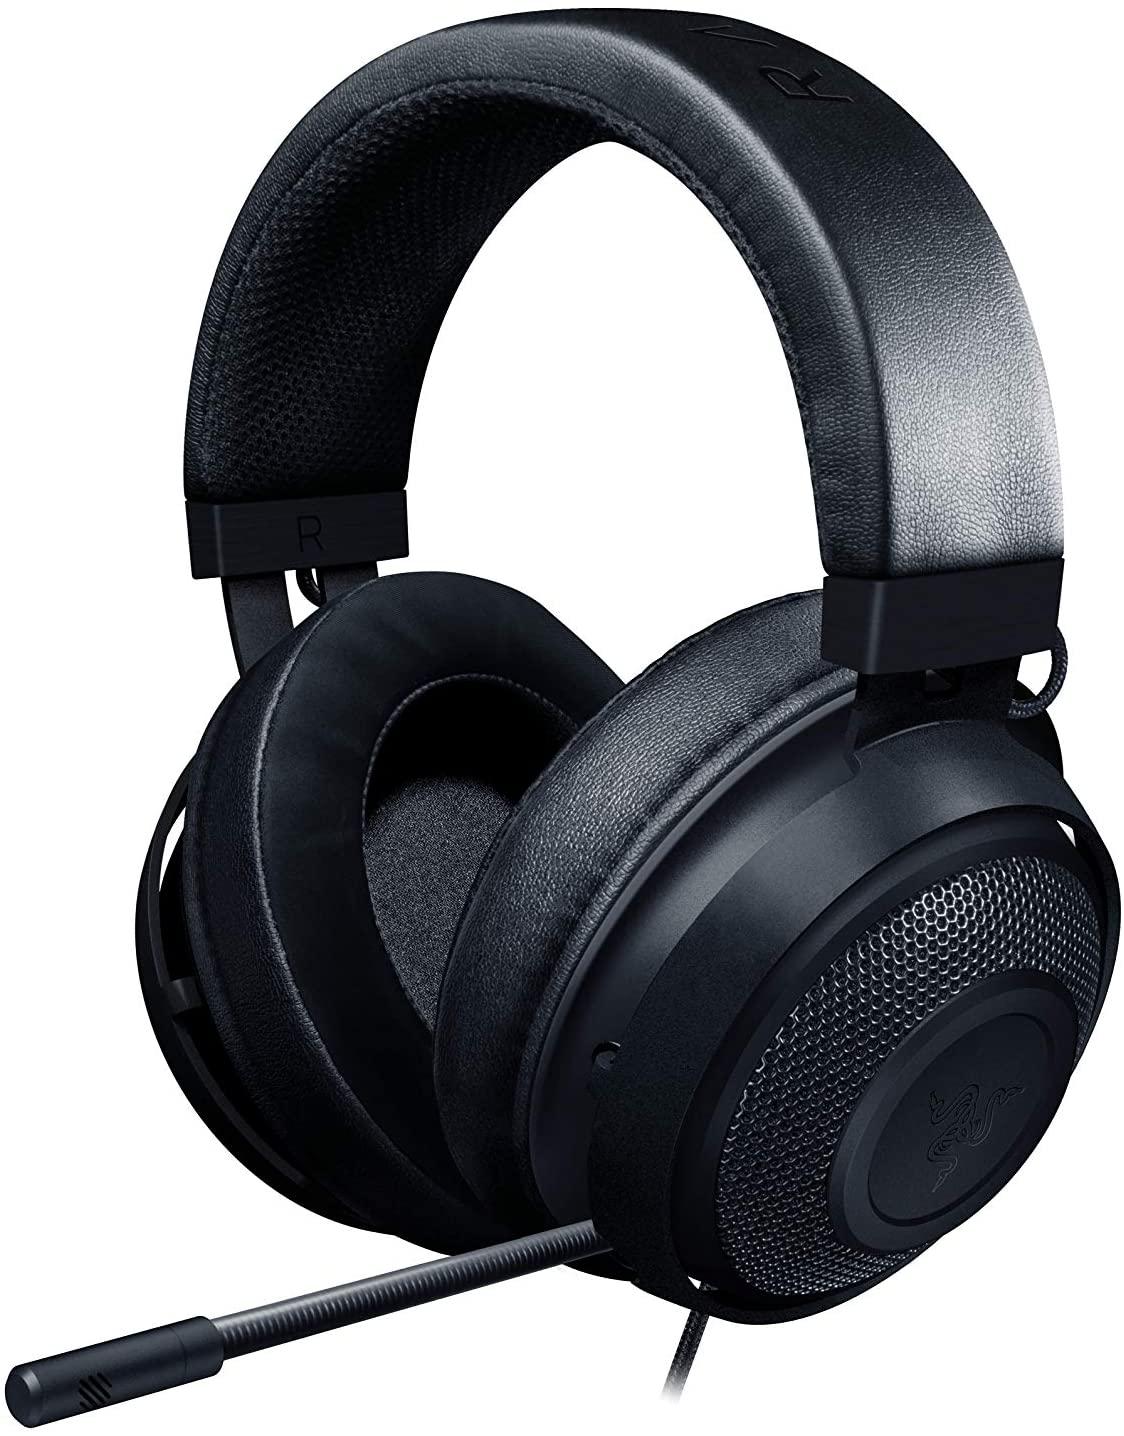 Razer Kraken Gaming Headset - £46.99 @ Amazon